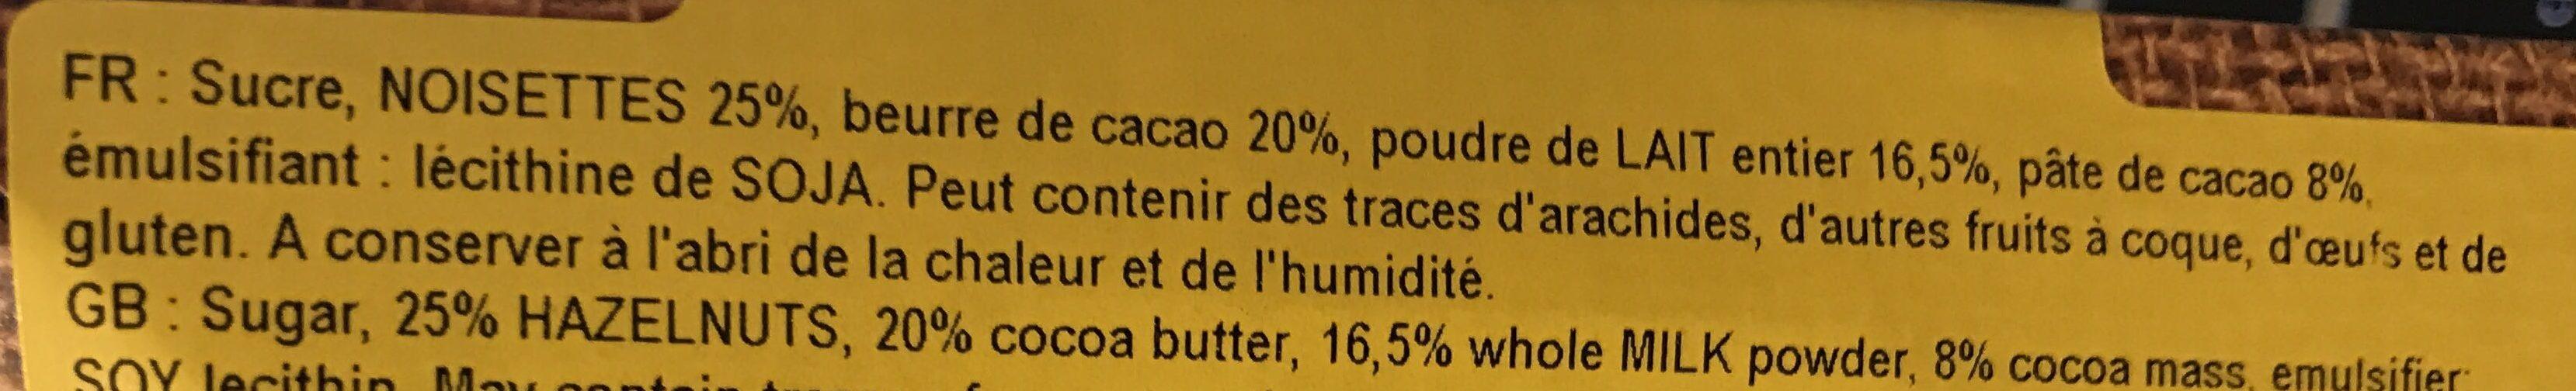 Chocolat au lait Praliné Gianduja - Ingredients - fr